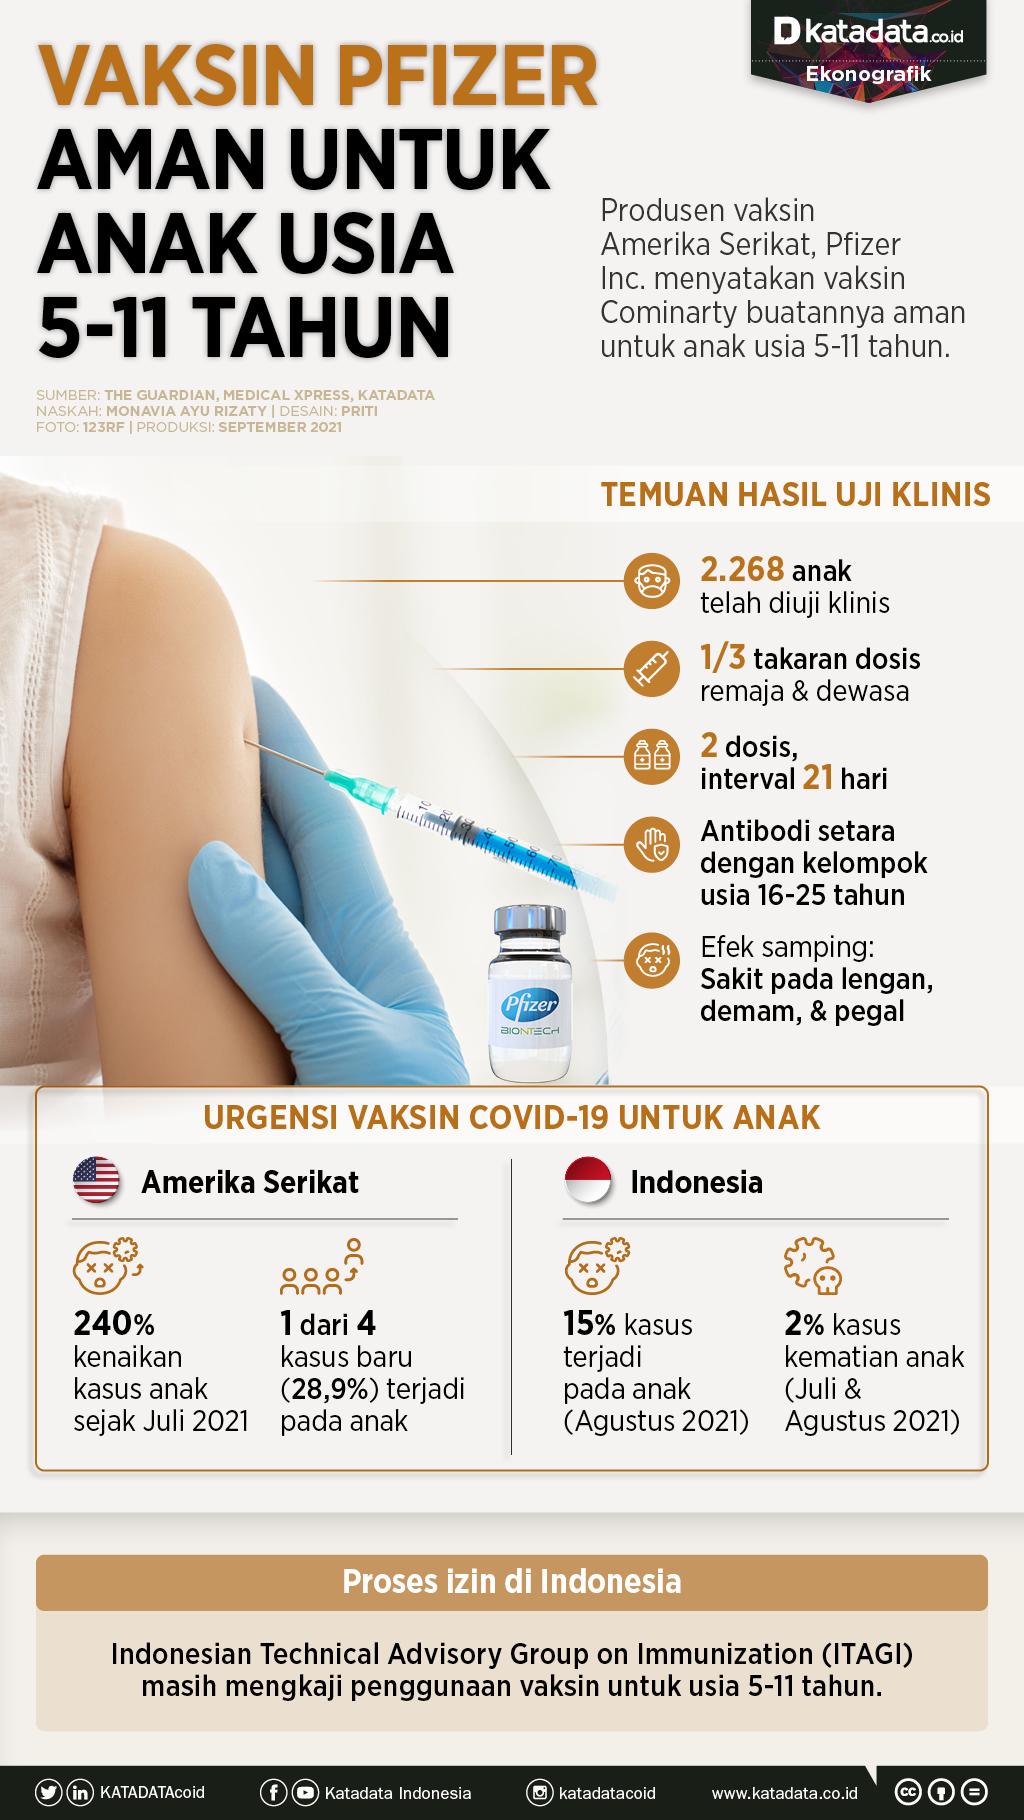 Infografik_Vaksin pfizer aman untuk anak usia 5-11 tahun